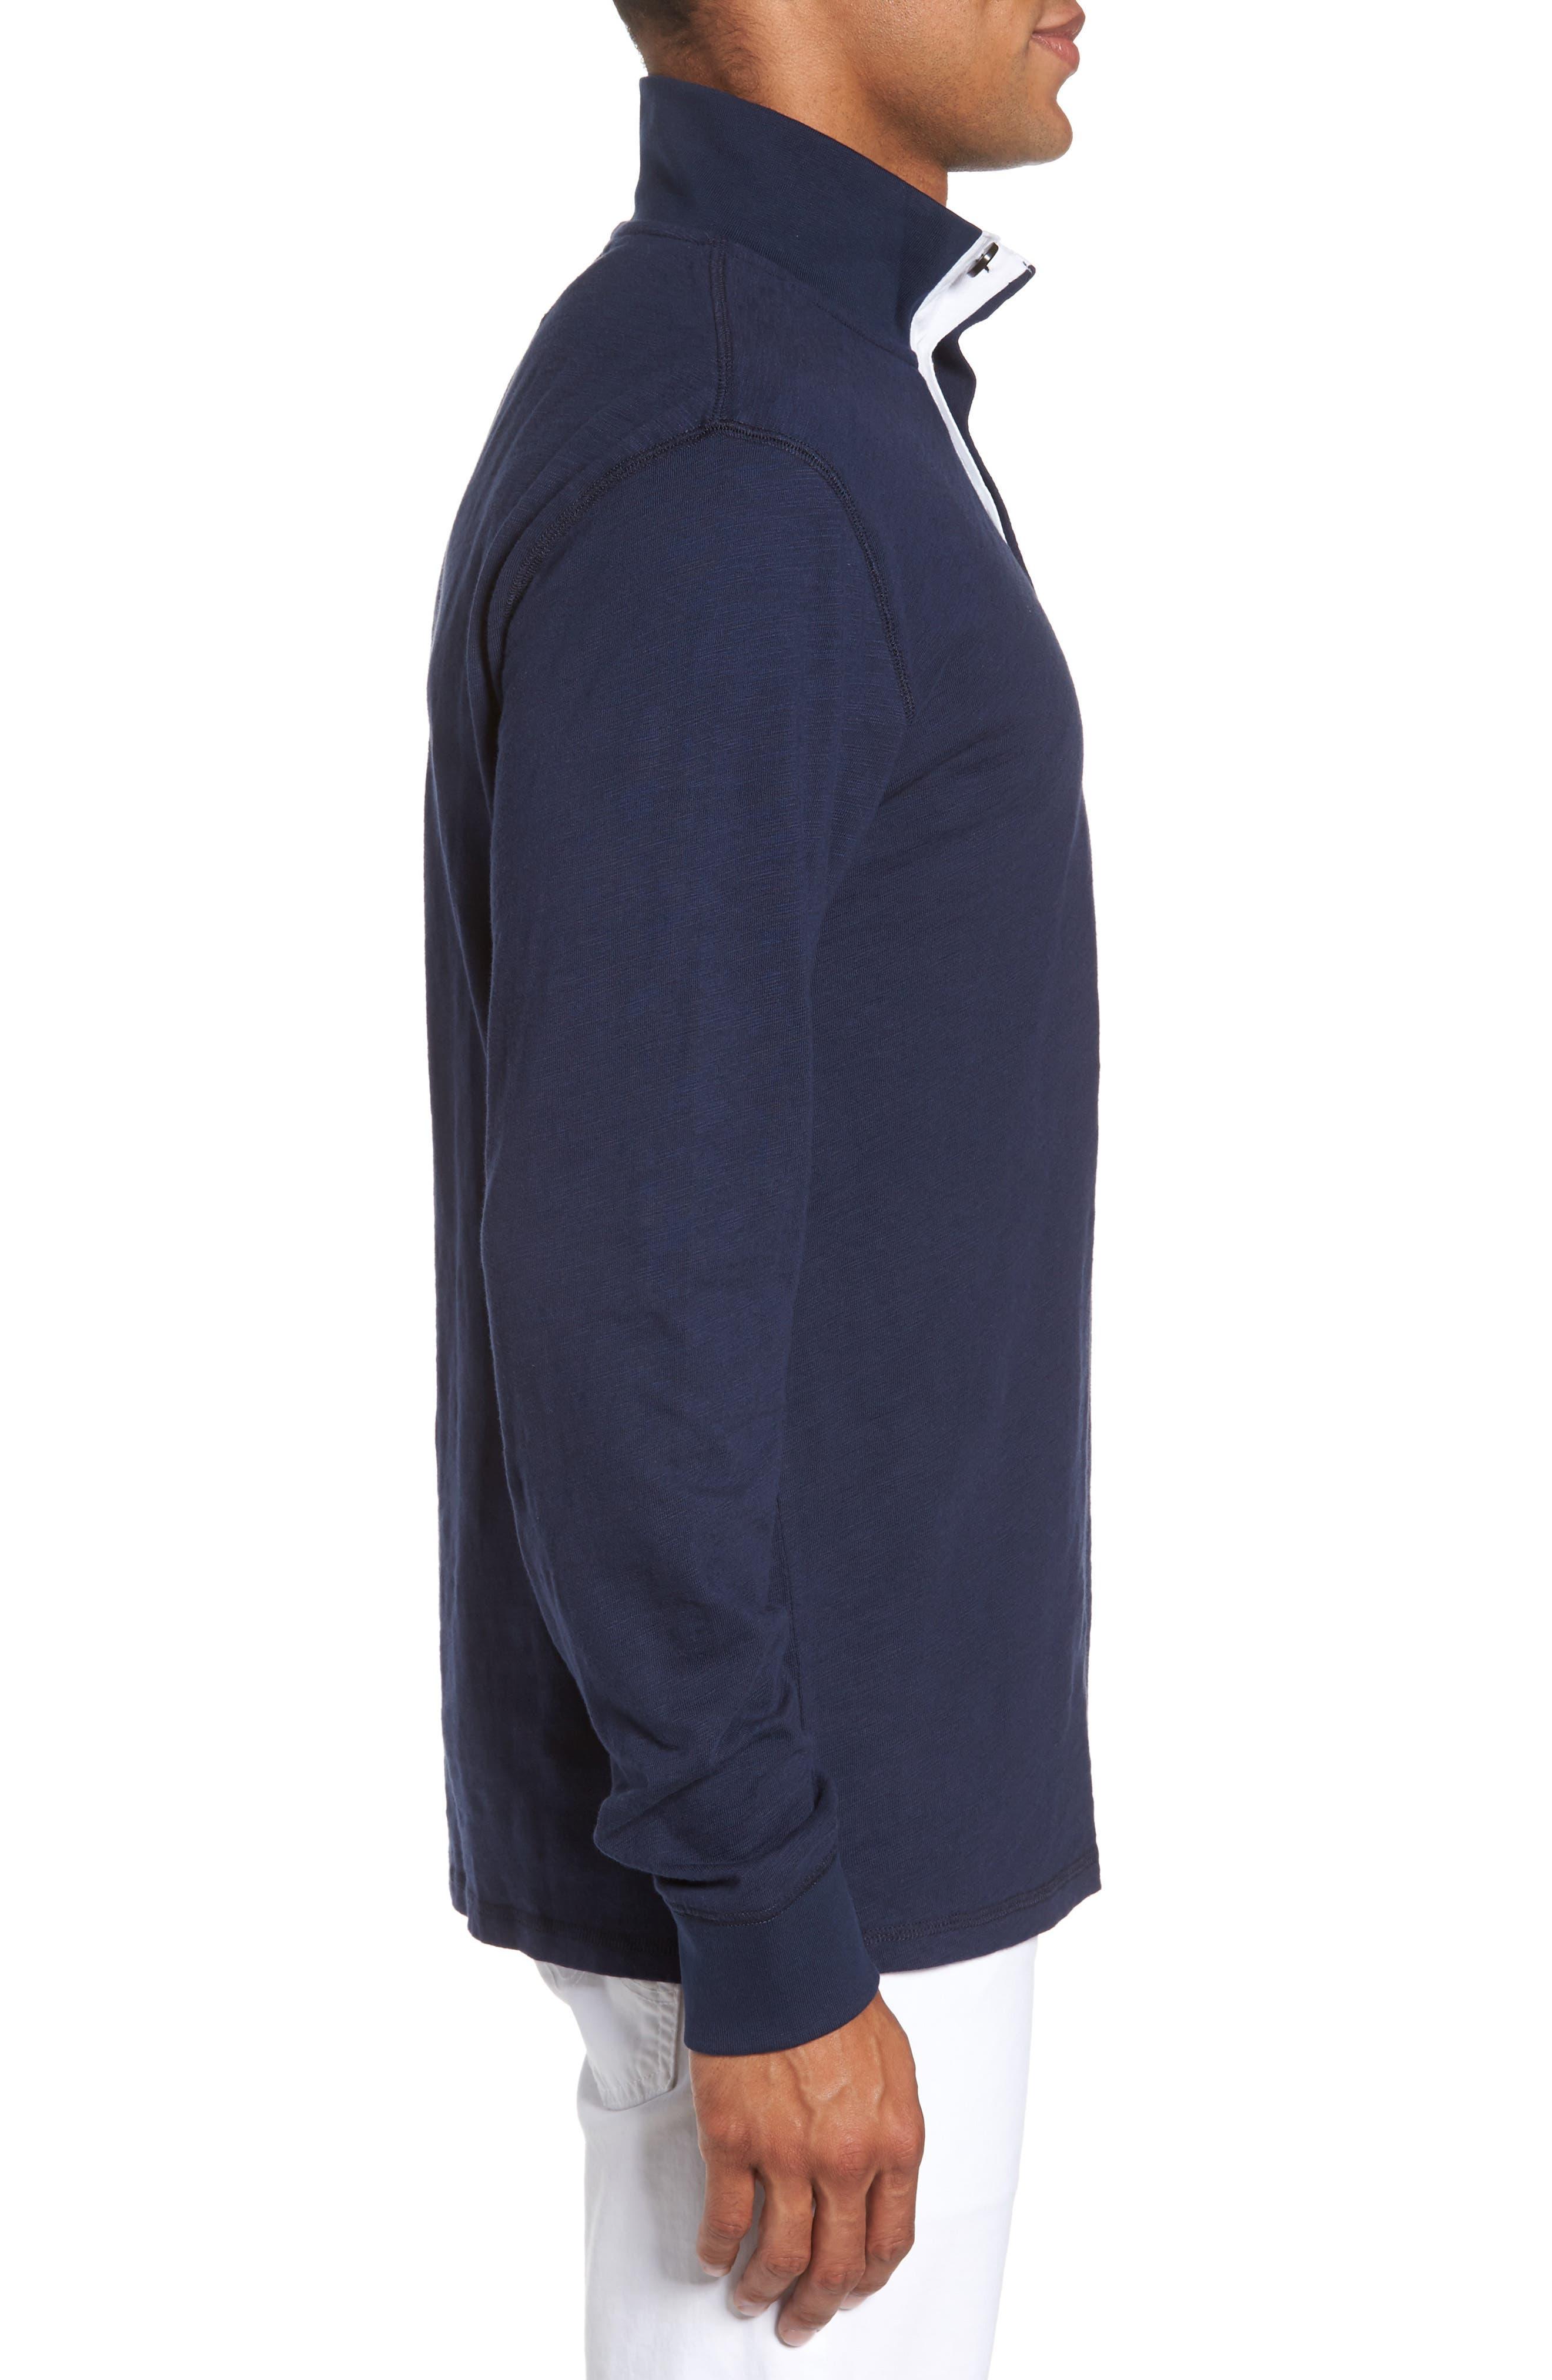 Gulf Stream Sweatshirt,                             Alternate thumbnail 3, color,                             408